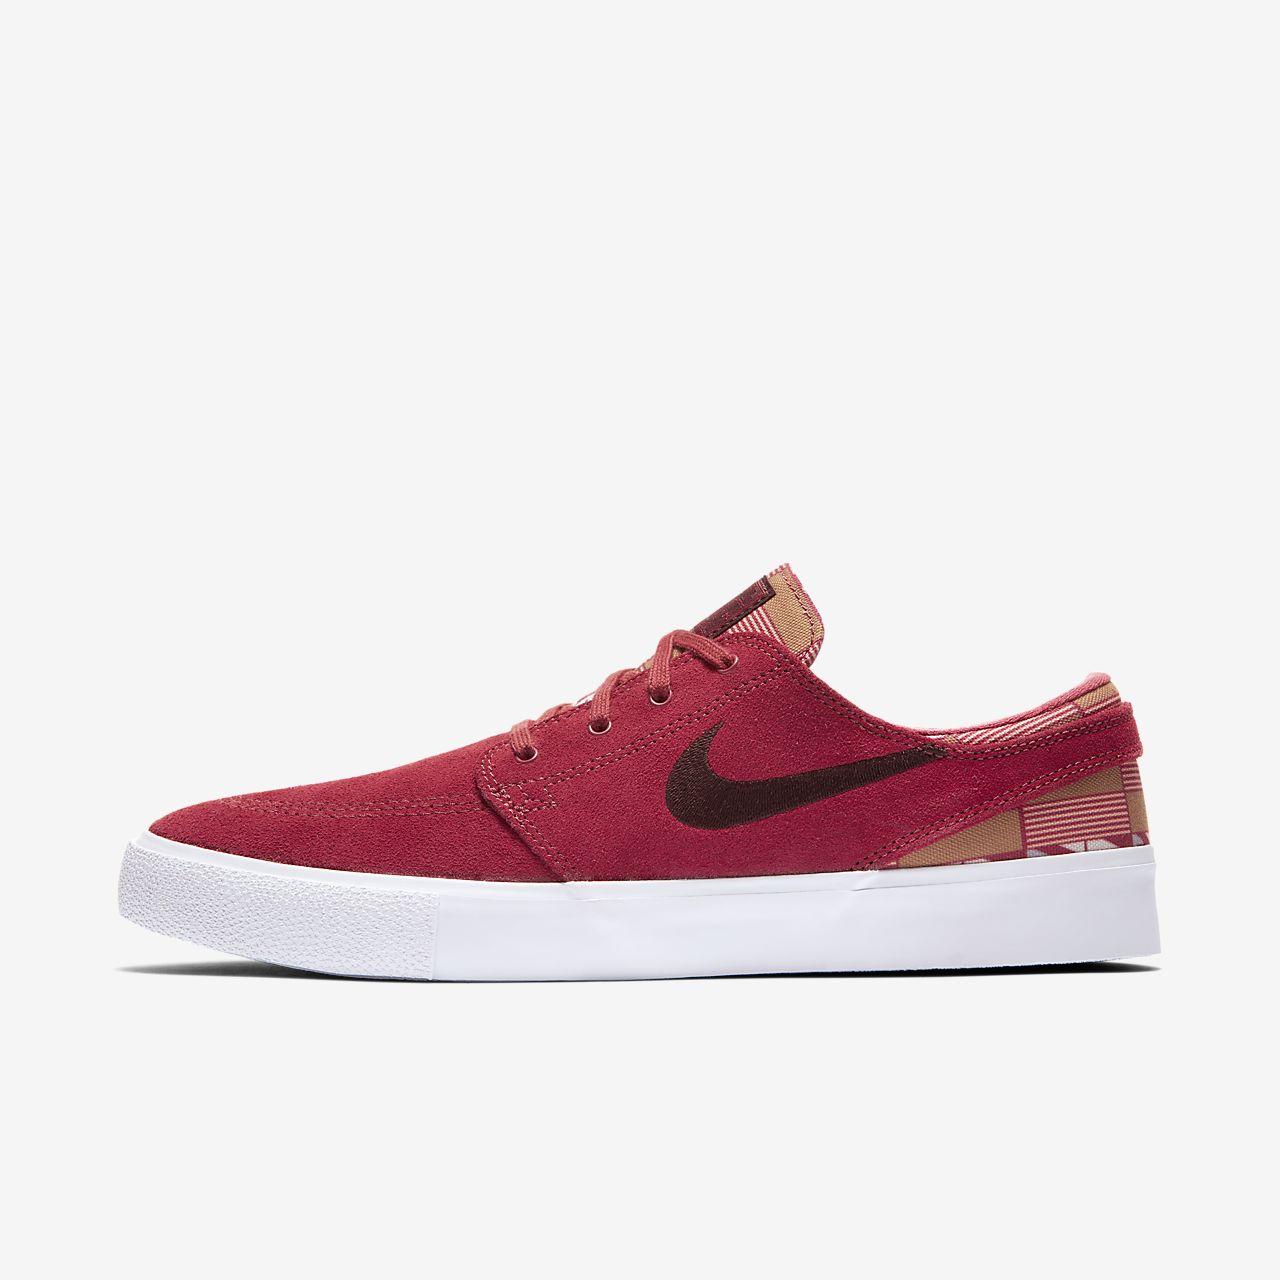 Scarpa da skateboard Nike SB Zoom Stefan Janoski RM Premium